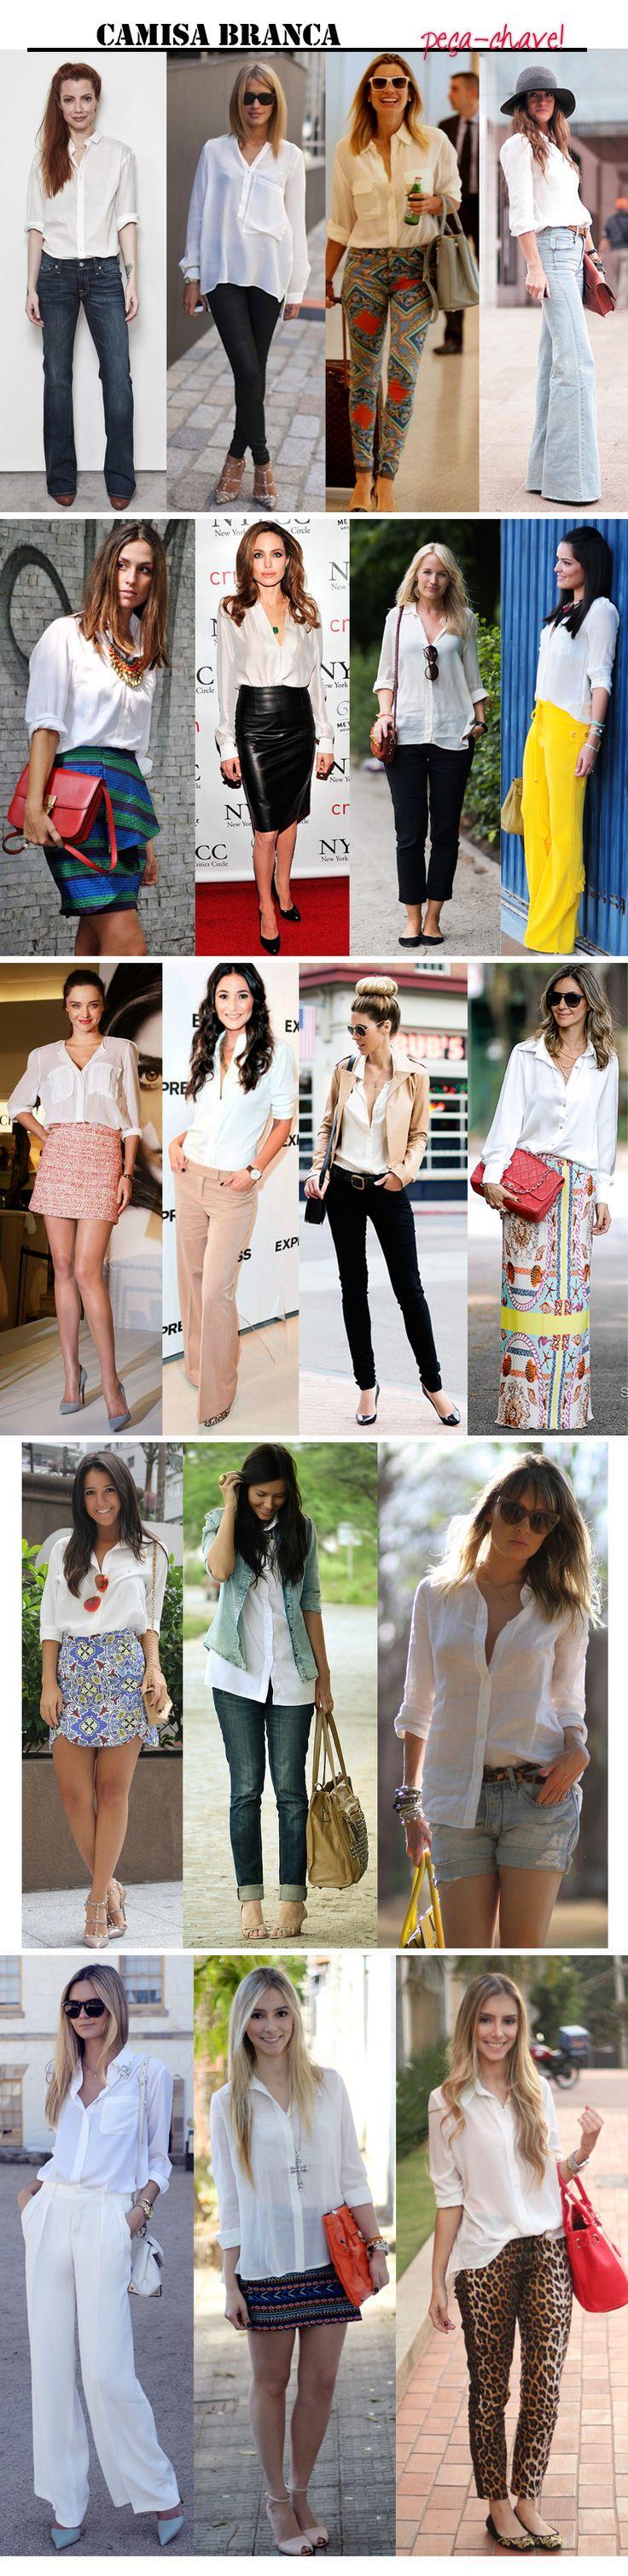 white shirt / chemise / camisa branca / stylish and basic  / otimização do guarda-roupa / looks / produções